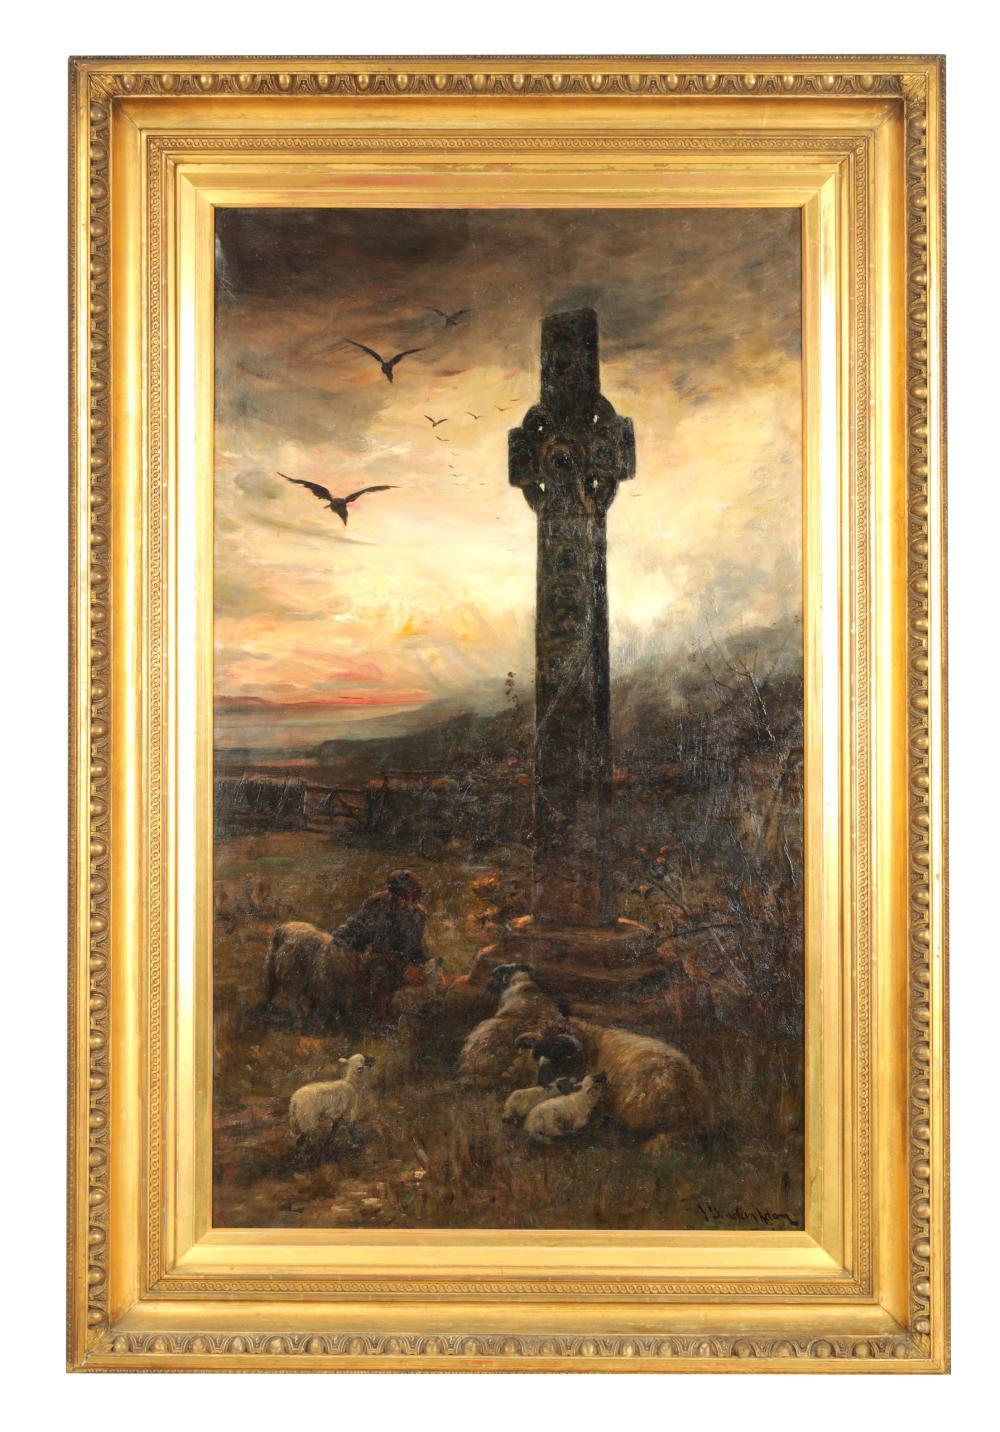 JOSEPH DENOVAN ADAM R.S.A., R.S.W (1842-1896) OIL ON CANVAS